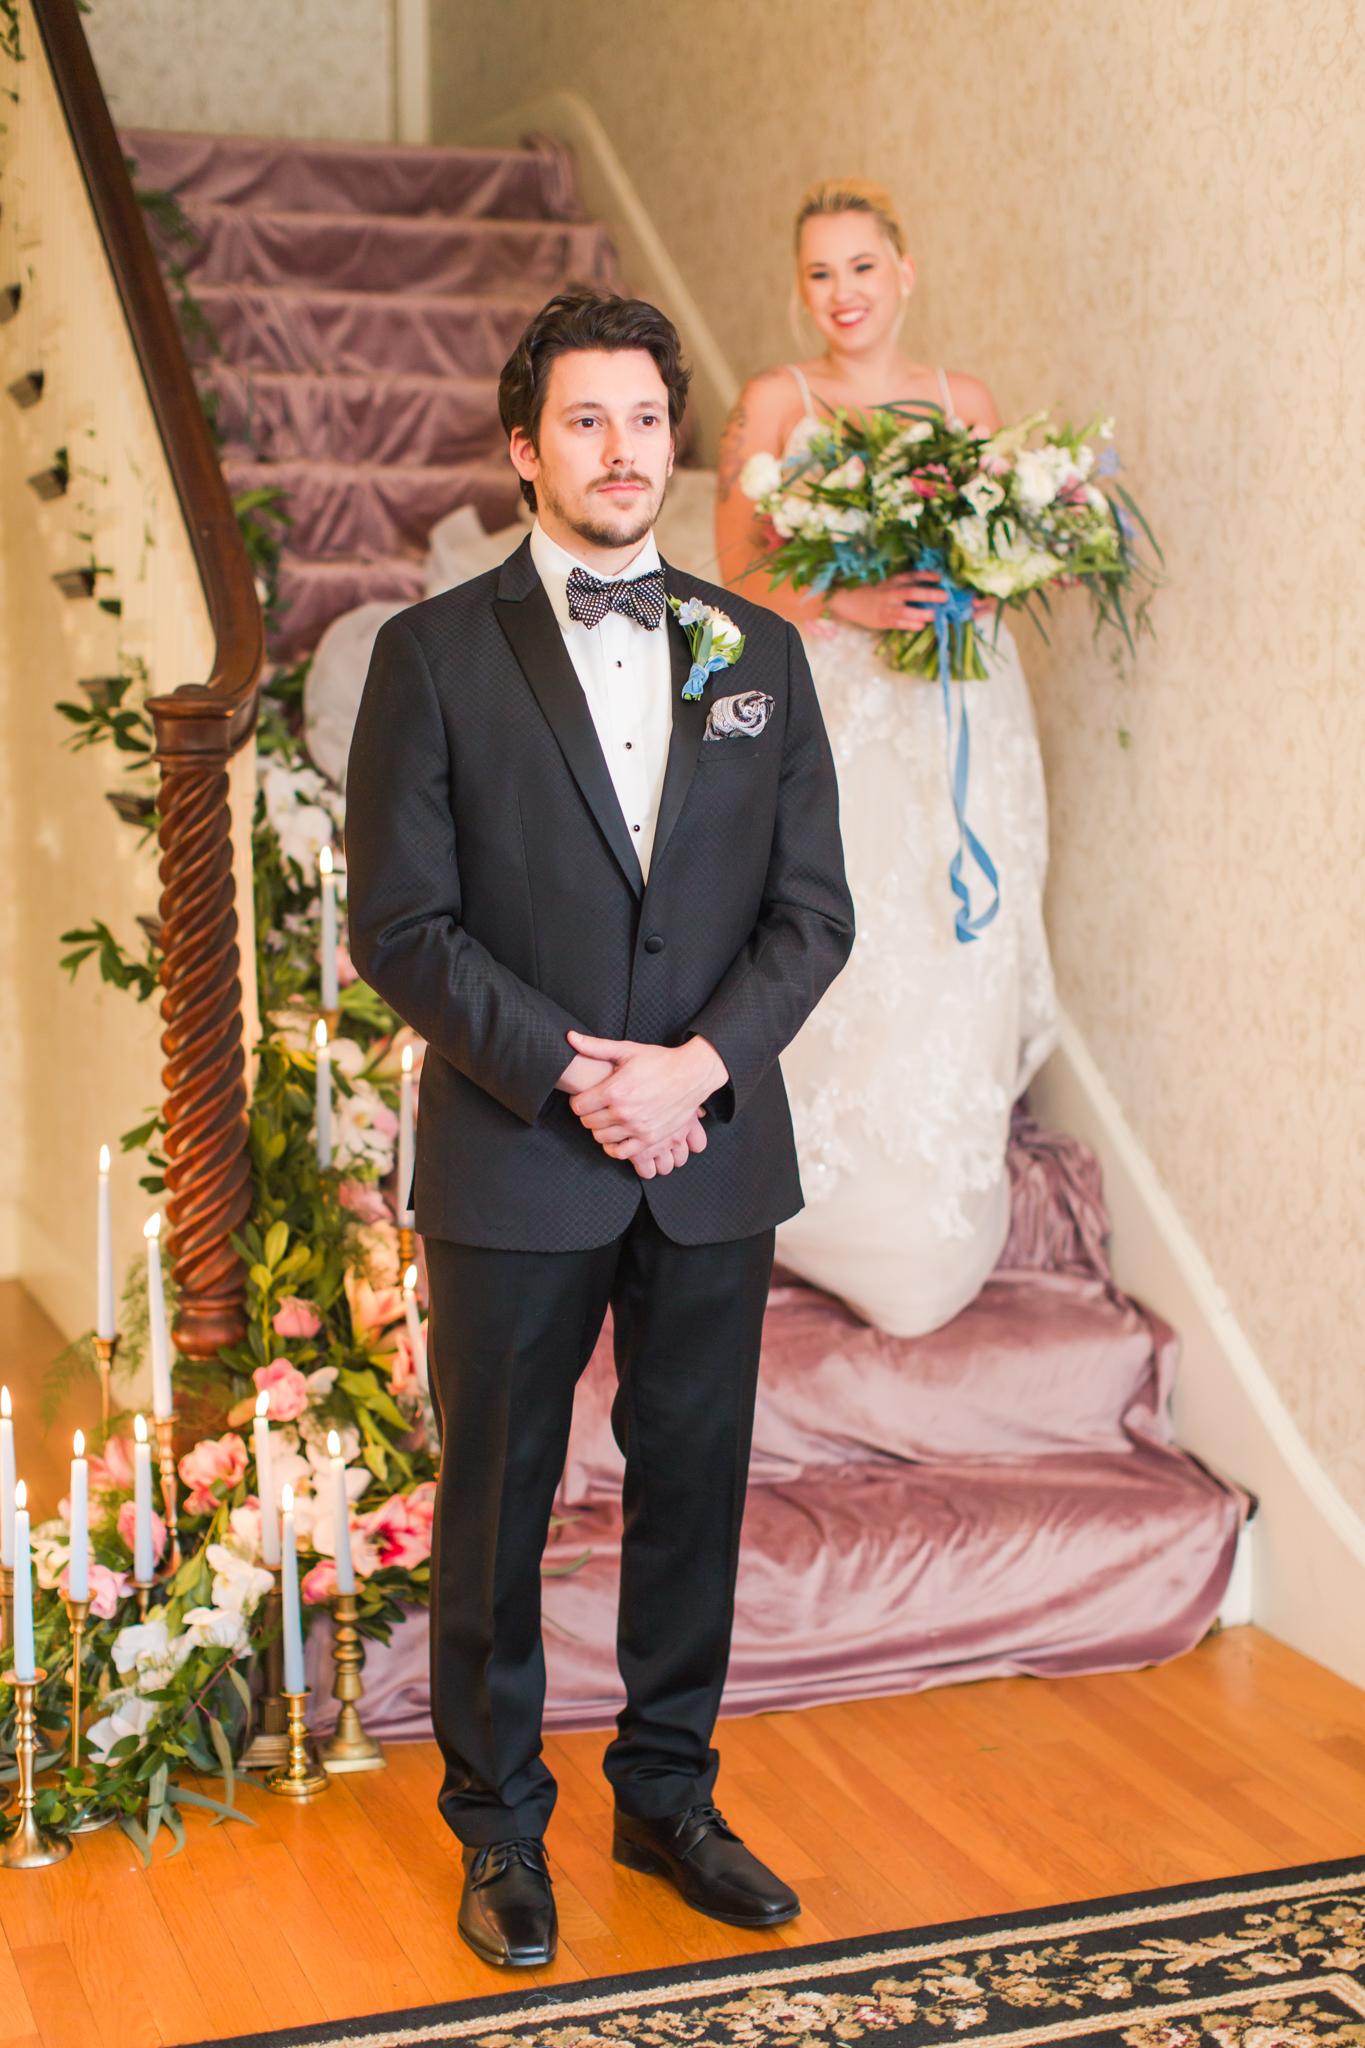 Haley Mansion Winter Wedding - Shaina Lee Photography-107.jpg